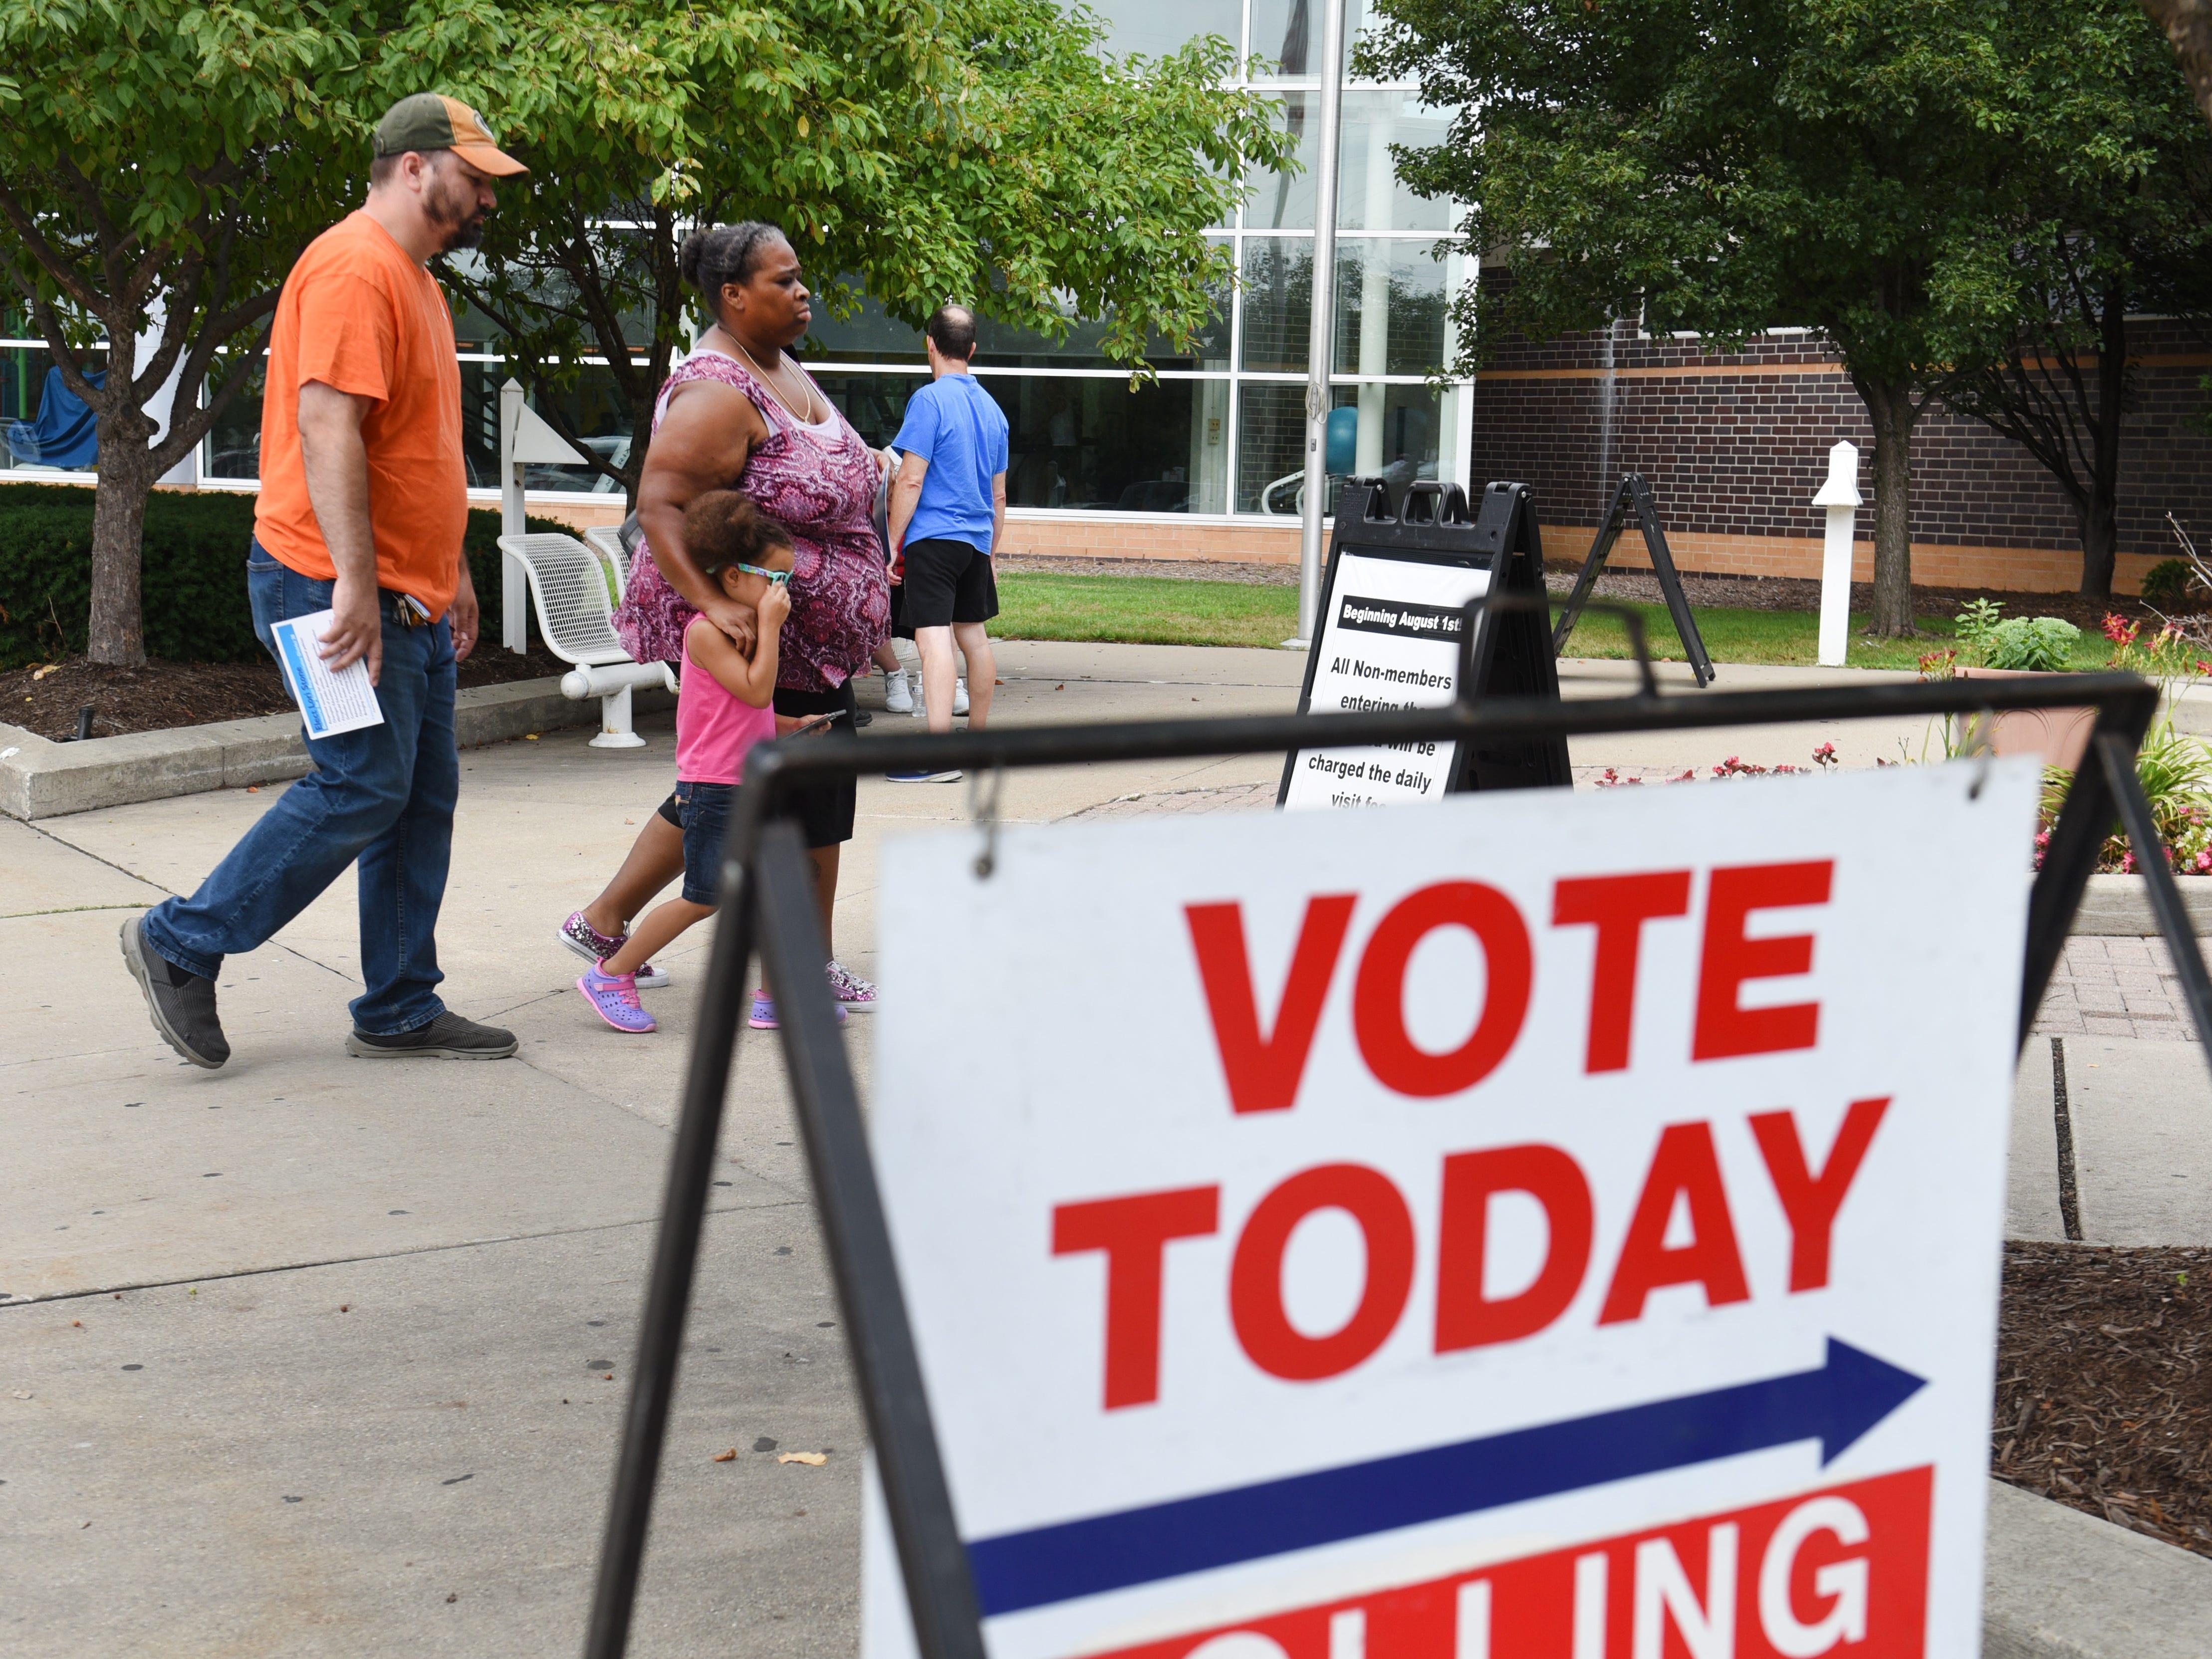 People enter the voting precinct on Tuesday outside Warren Community Center in Warren.